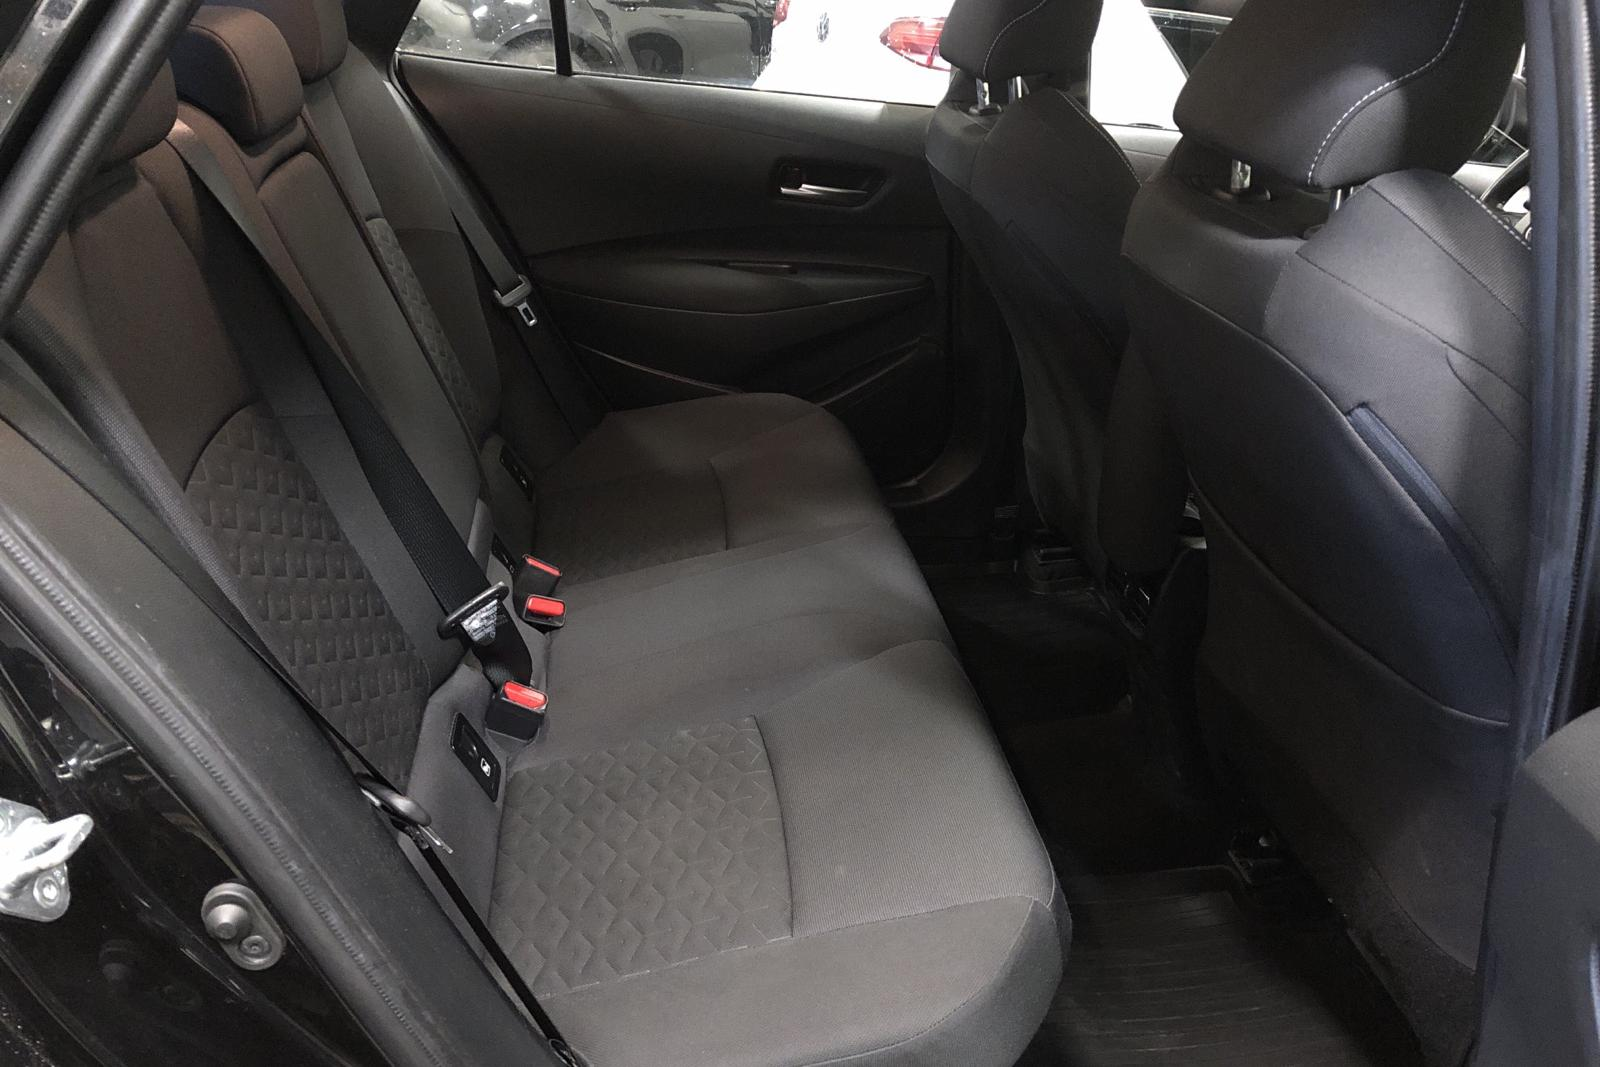 Toyota Corolla 1.8 Hybrid Touring Sports (122hk) - 0 km - Automatic - black - 2020